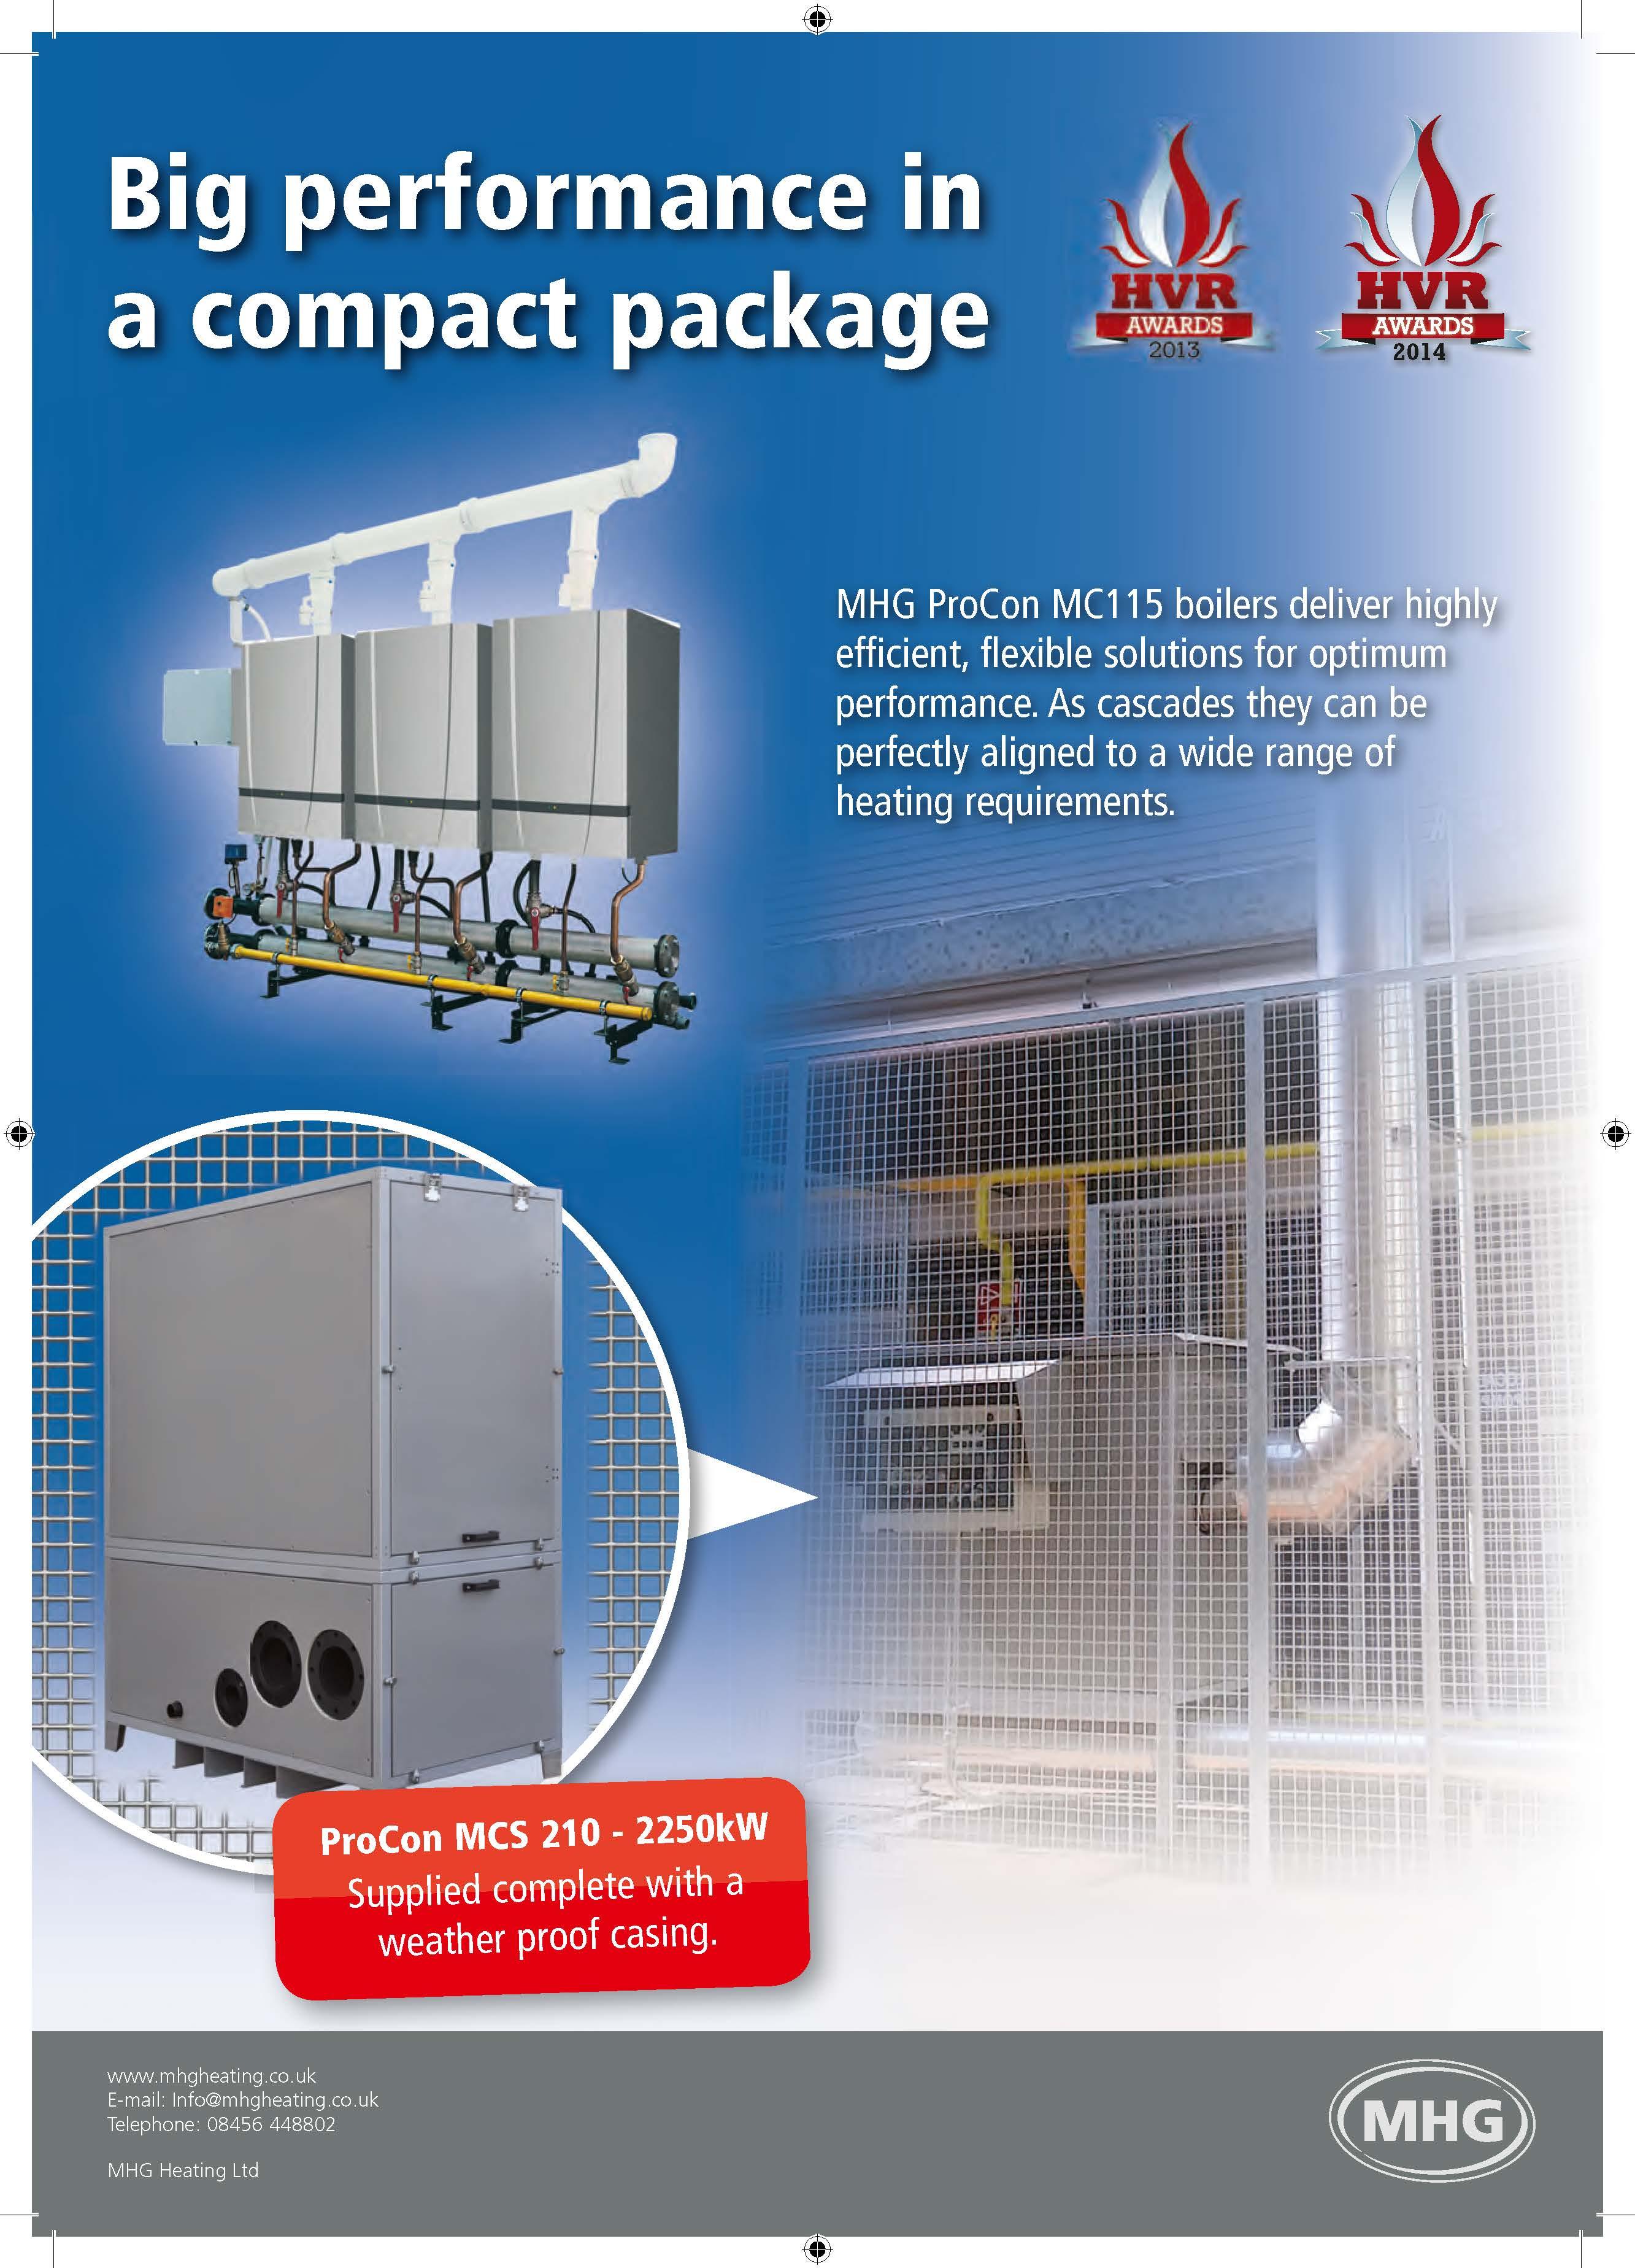 Journal Adverts - MHG Heating